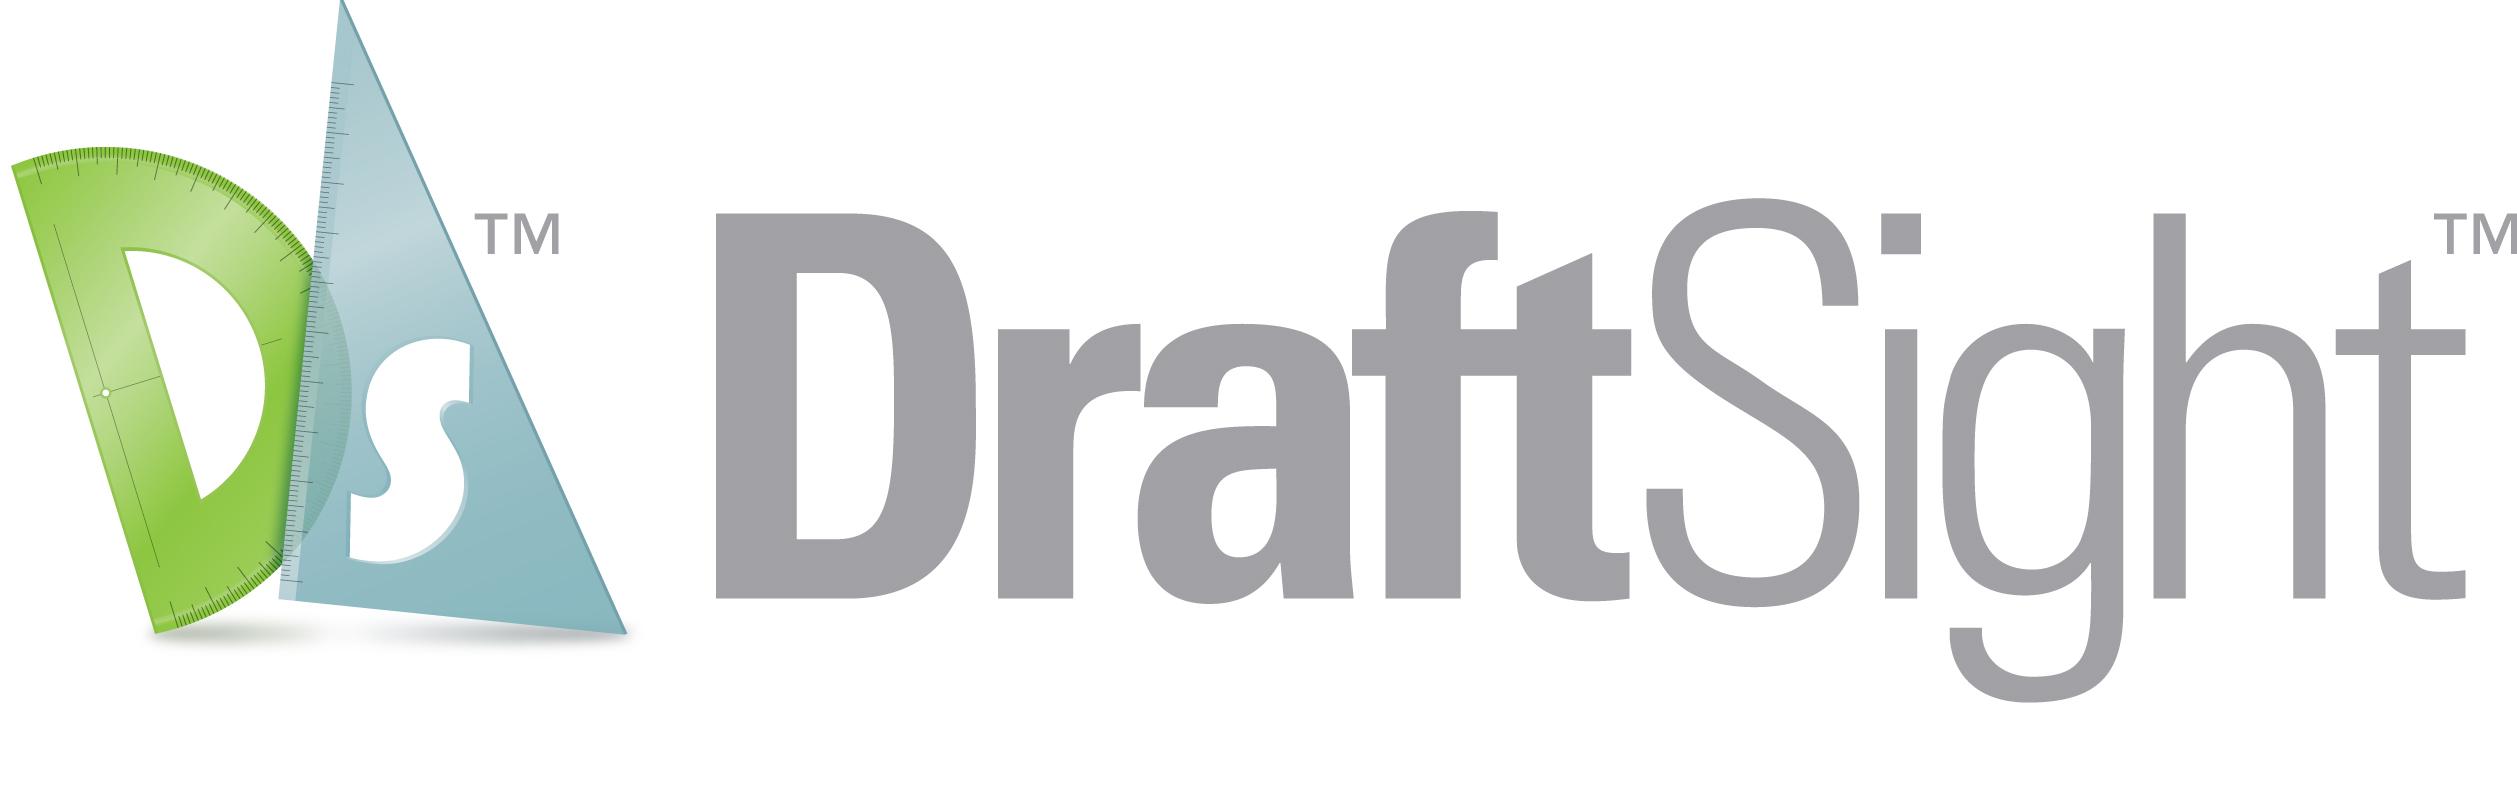 DraftSight: O AutoCad 2D da Dassault